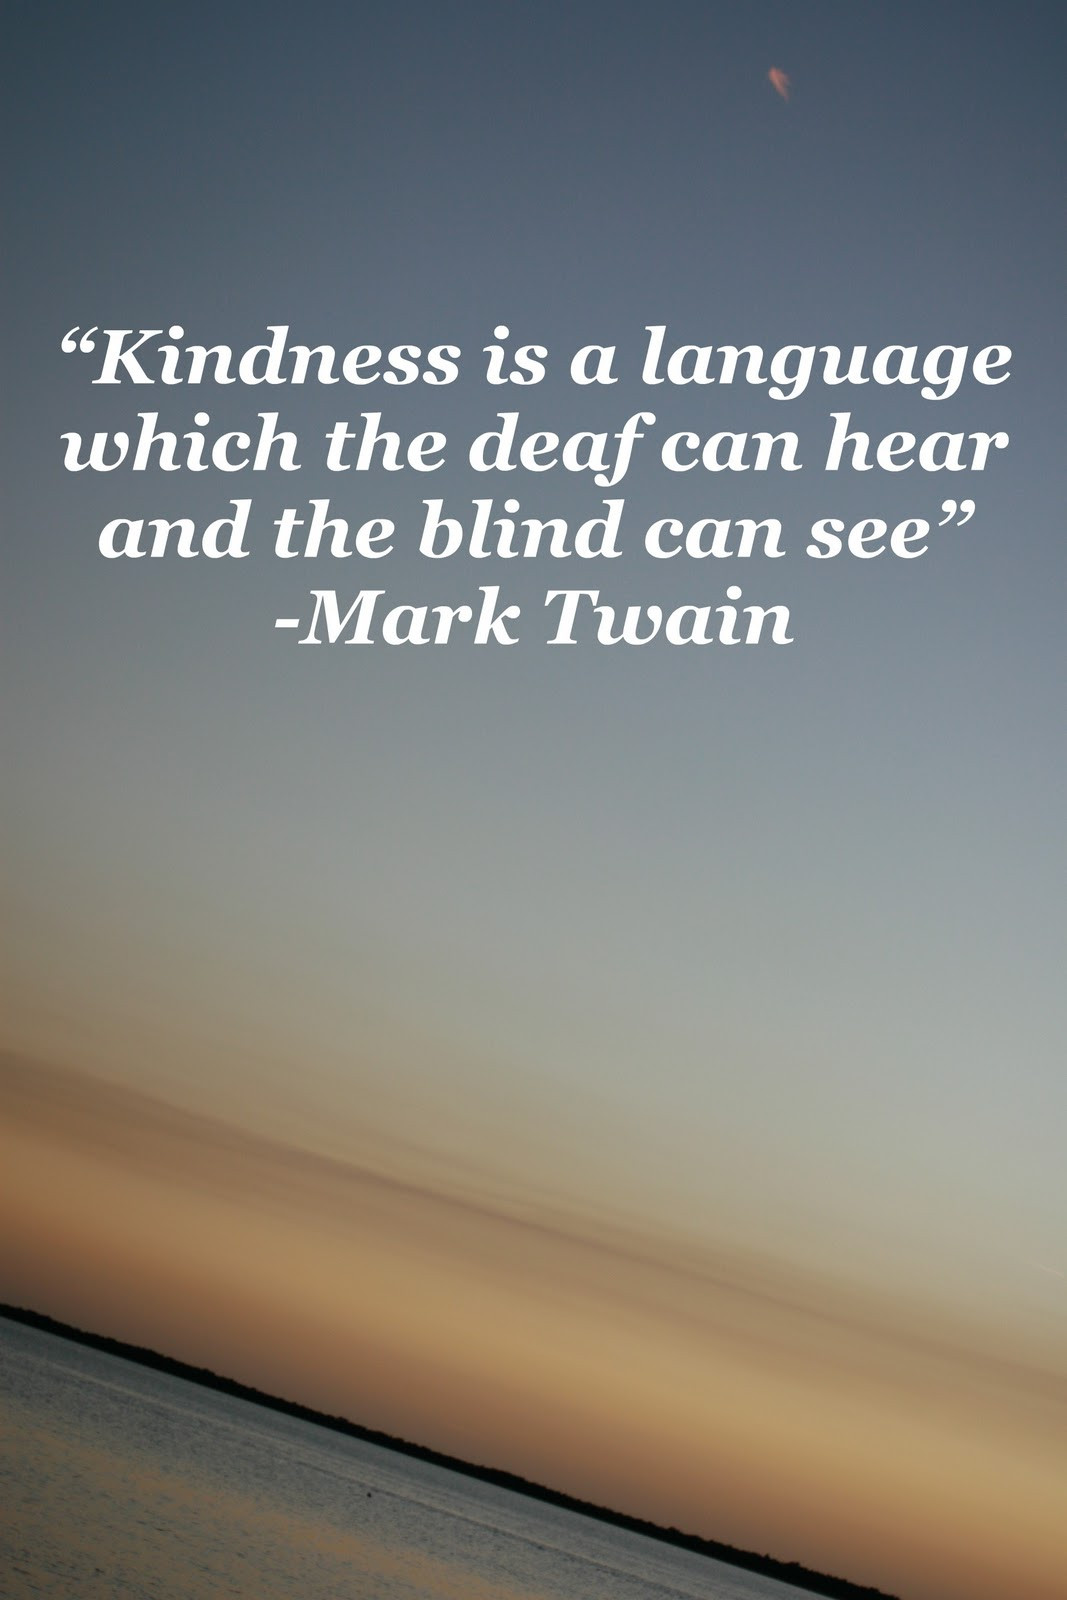 Mark Twain Kindness Quote  mark twain quote kindness